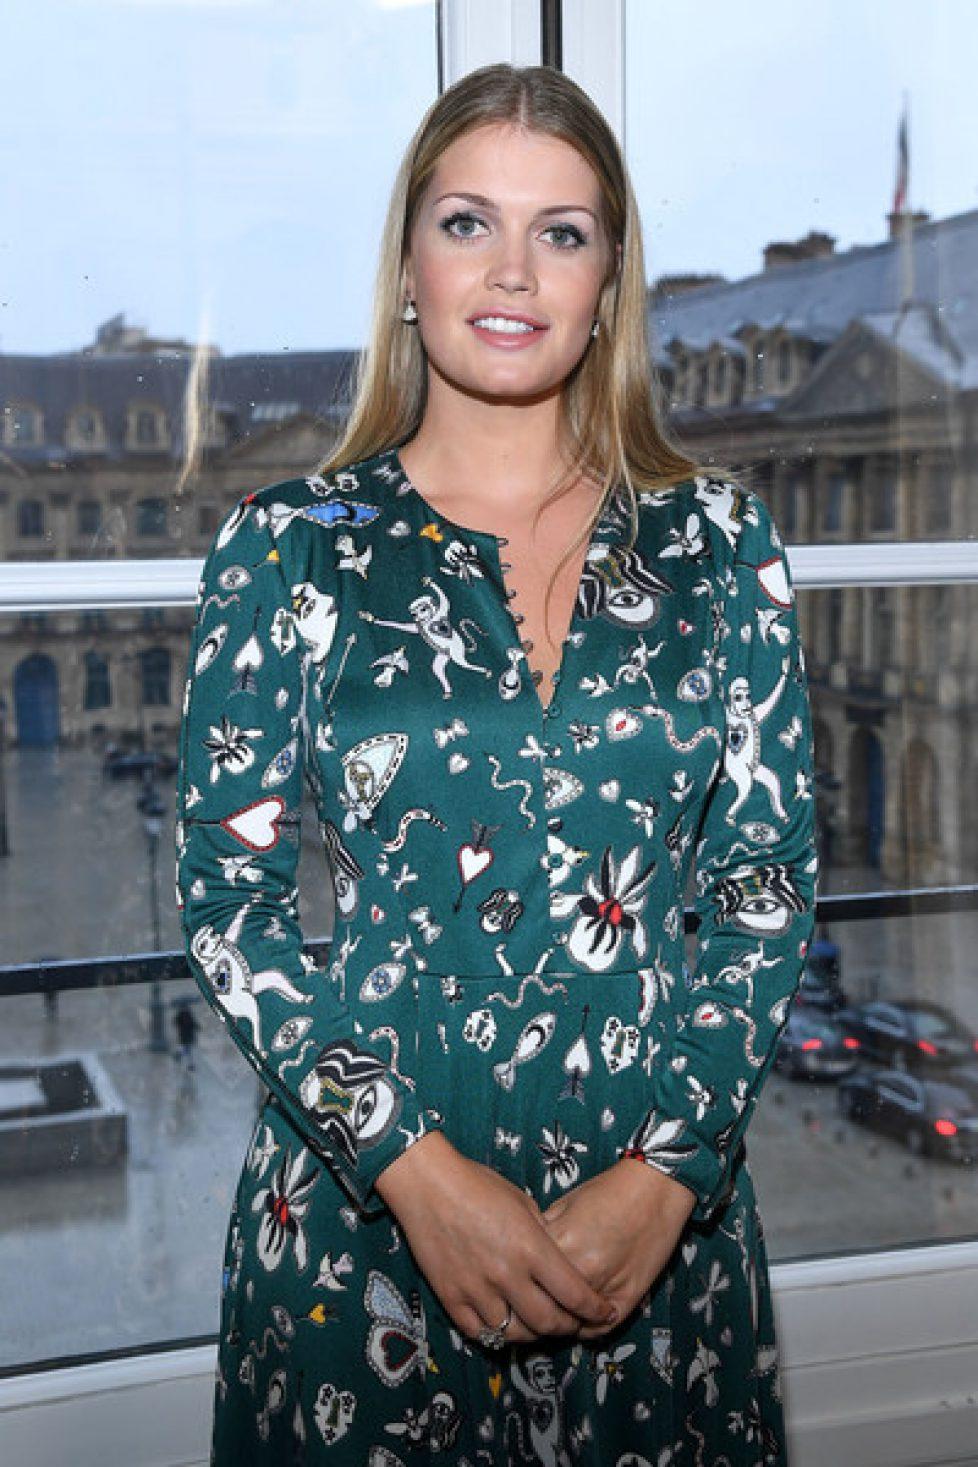 Schiaparelli+Front+Row+Paris+Fashion+Week+_73uOLpkhSKl